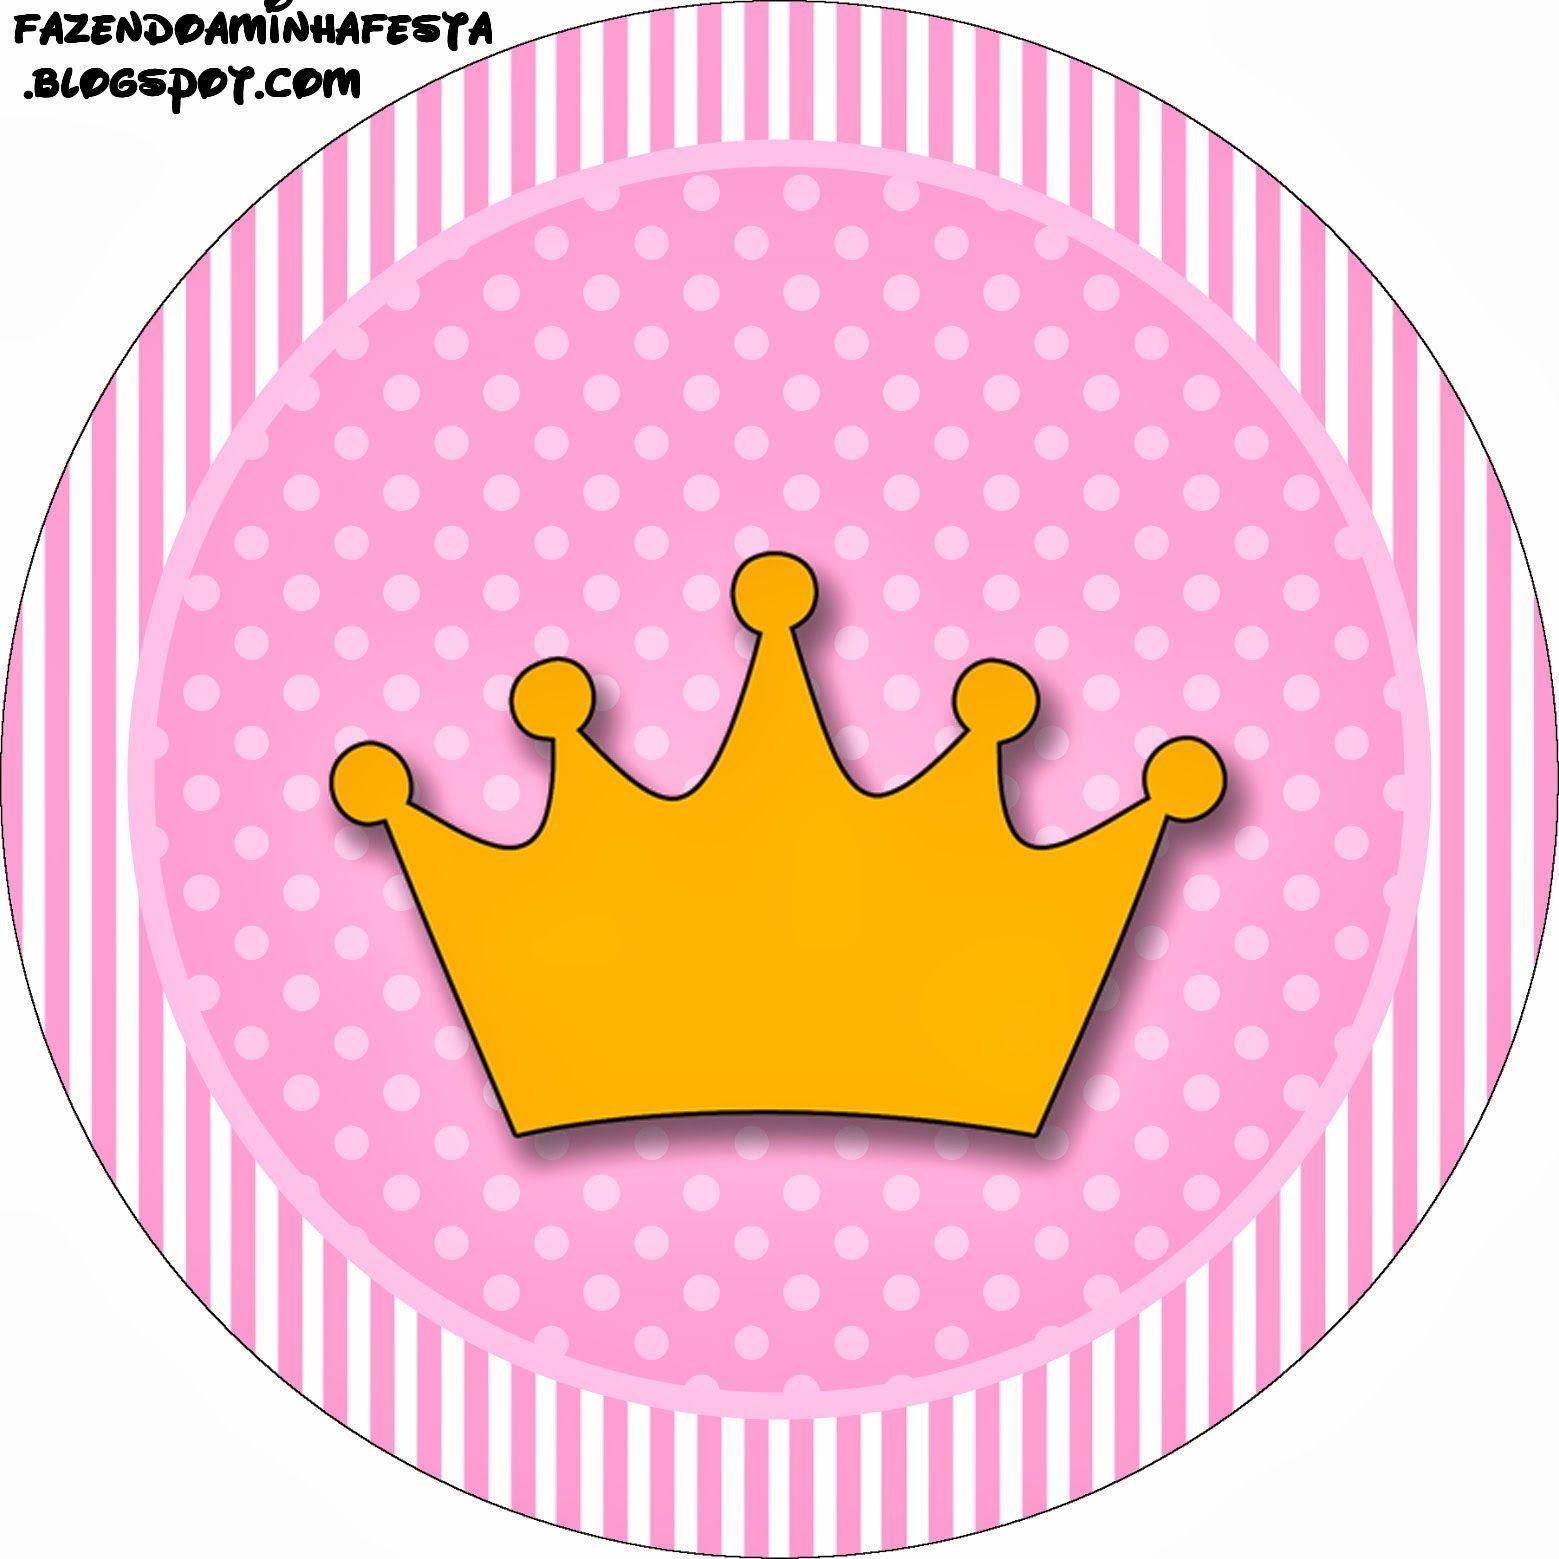 coroa princesa kit completo com molduras para convites princess crown clipart outline clip art princess crown blue